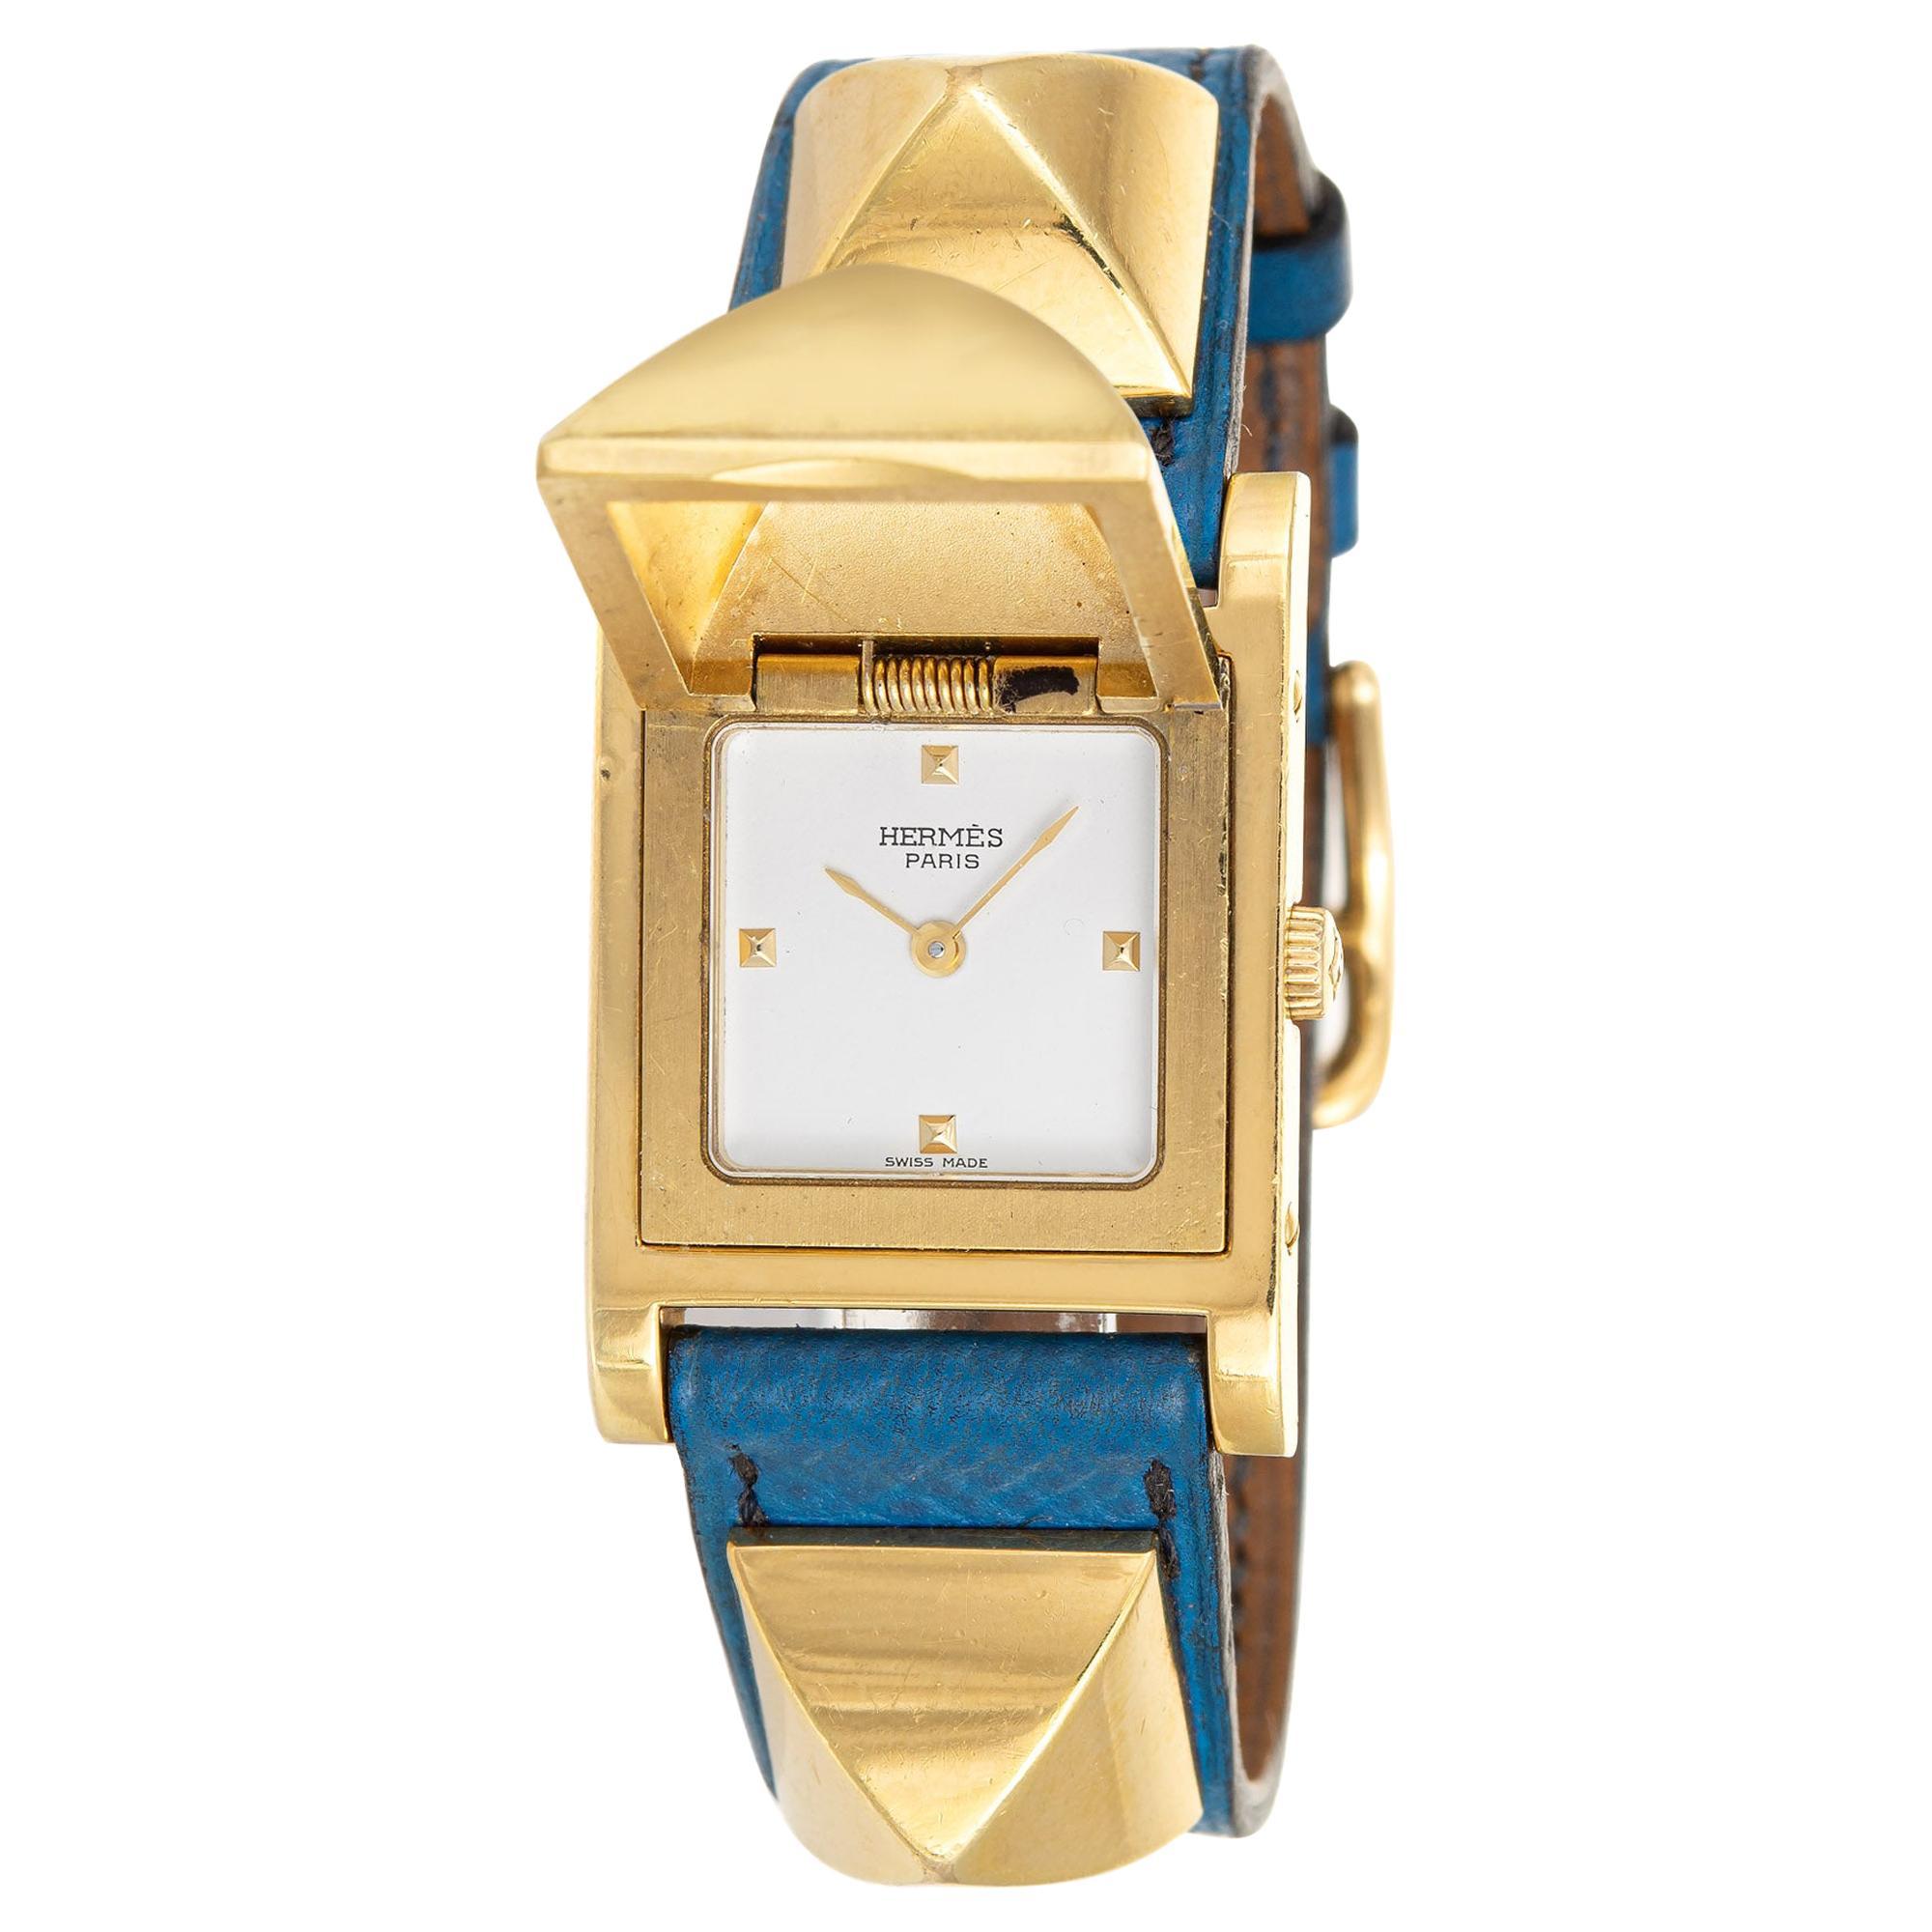 Hermès Medor Watch c1994 Blue Leather Strap Estate Fine Jewelry Pyramid Case